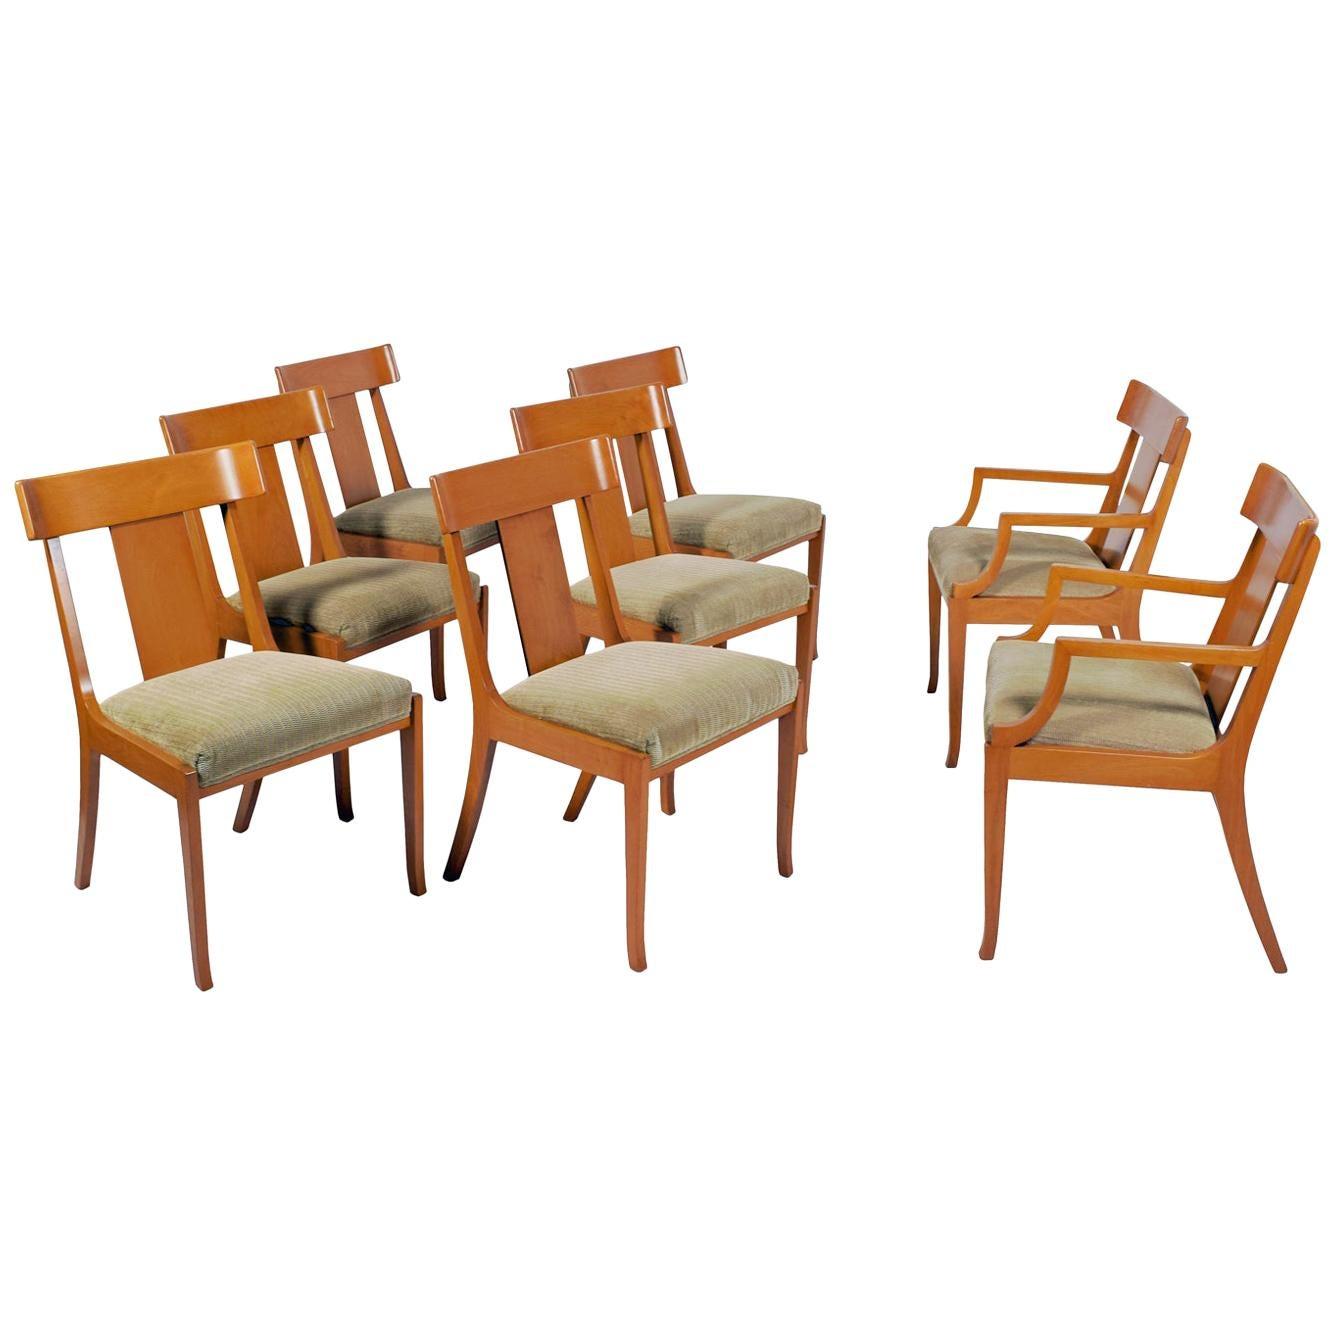 Set of Eight T.H. Robsjohn-Gibbings Dining Chairs for Widdicomb